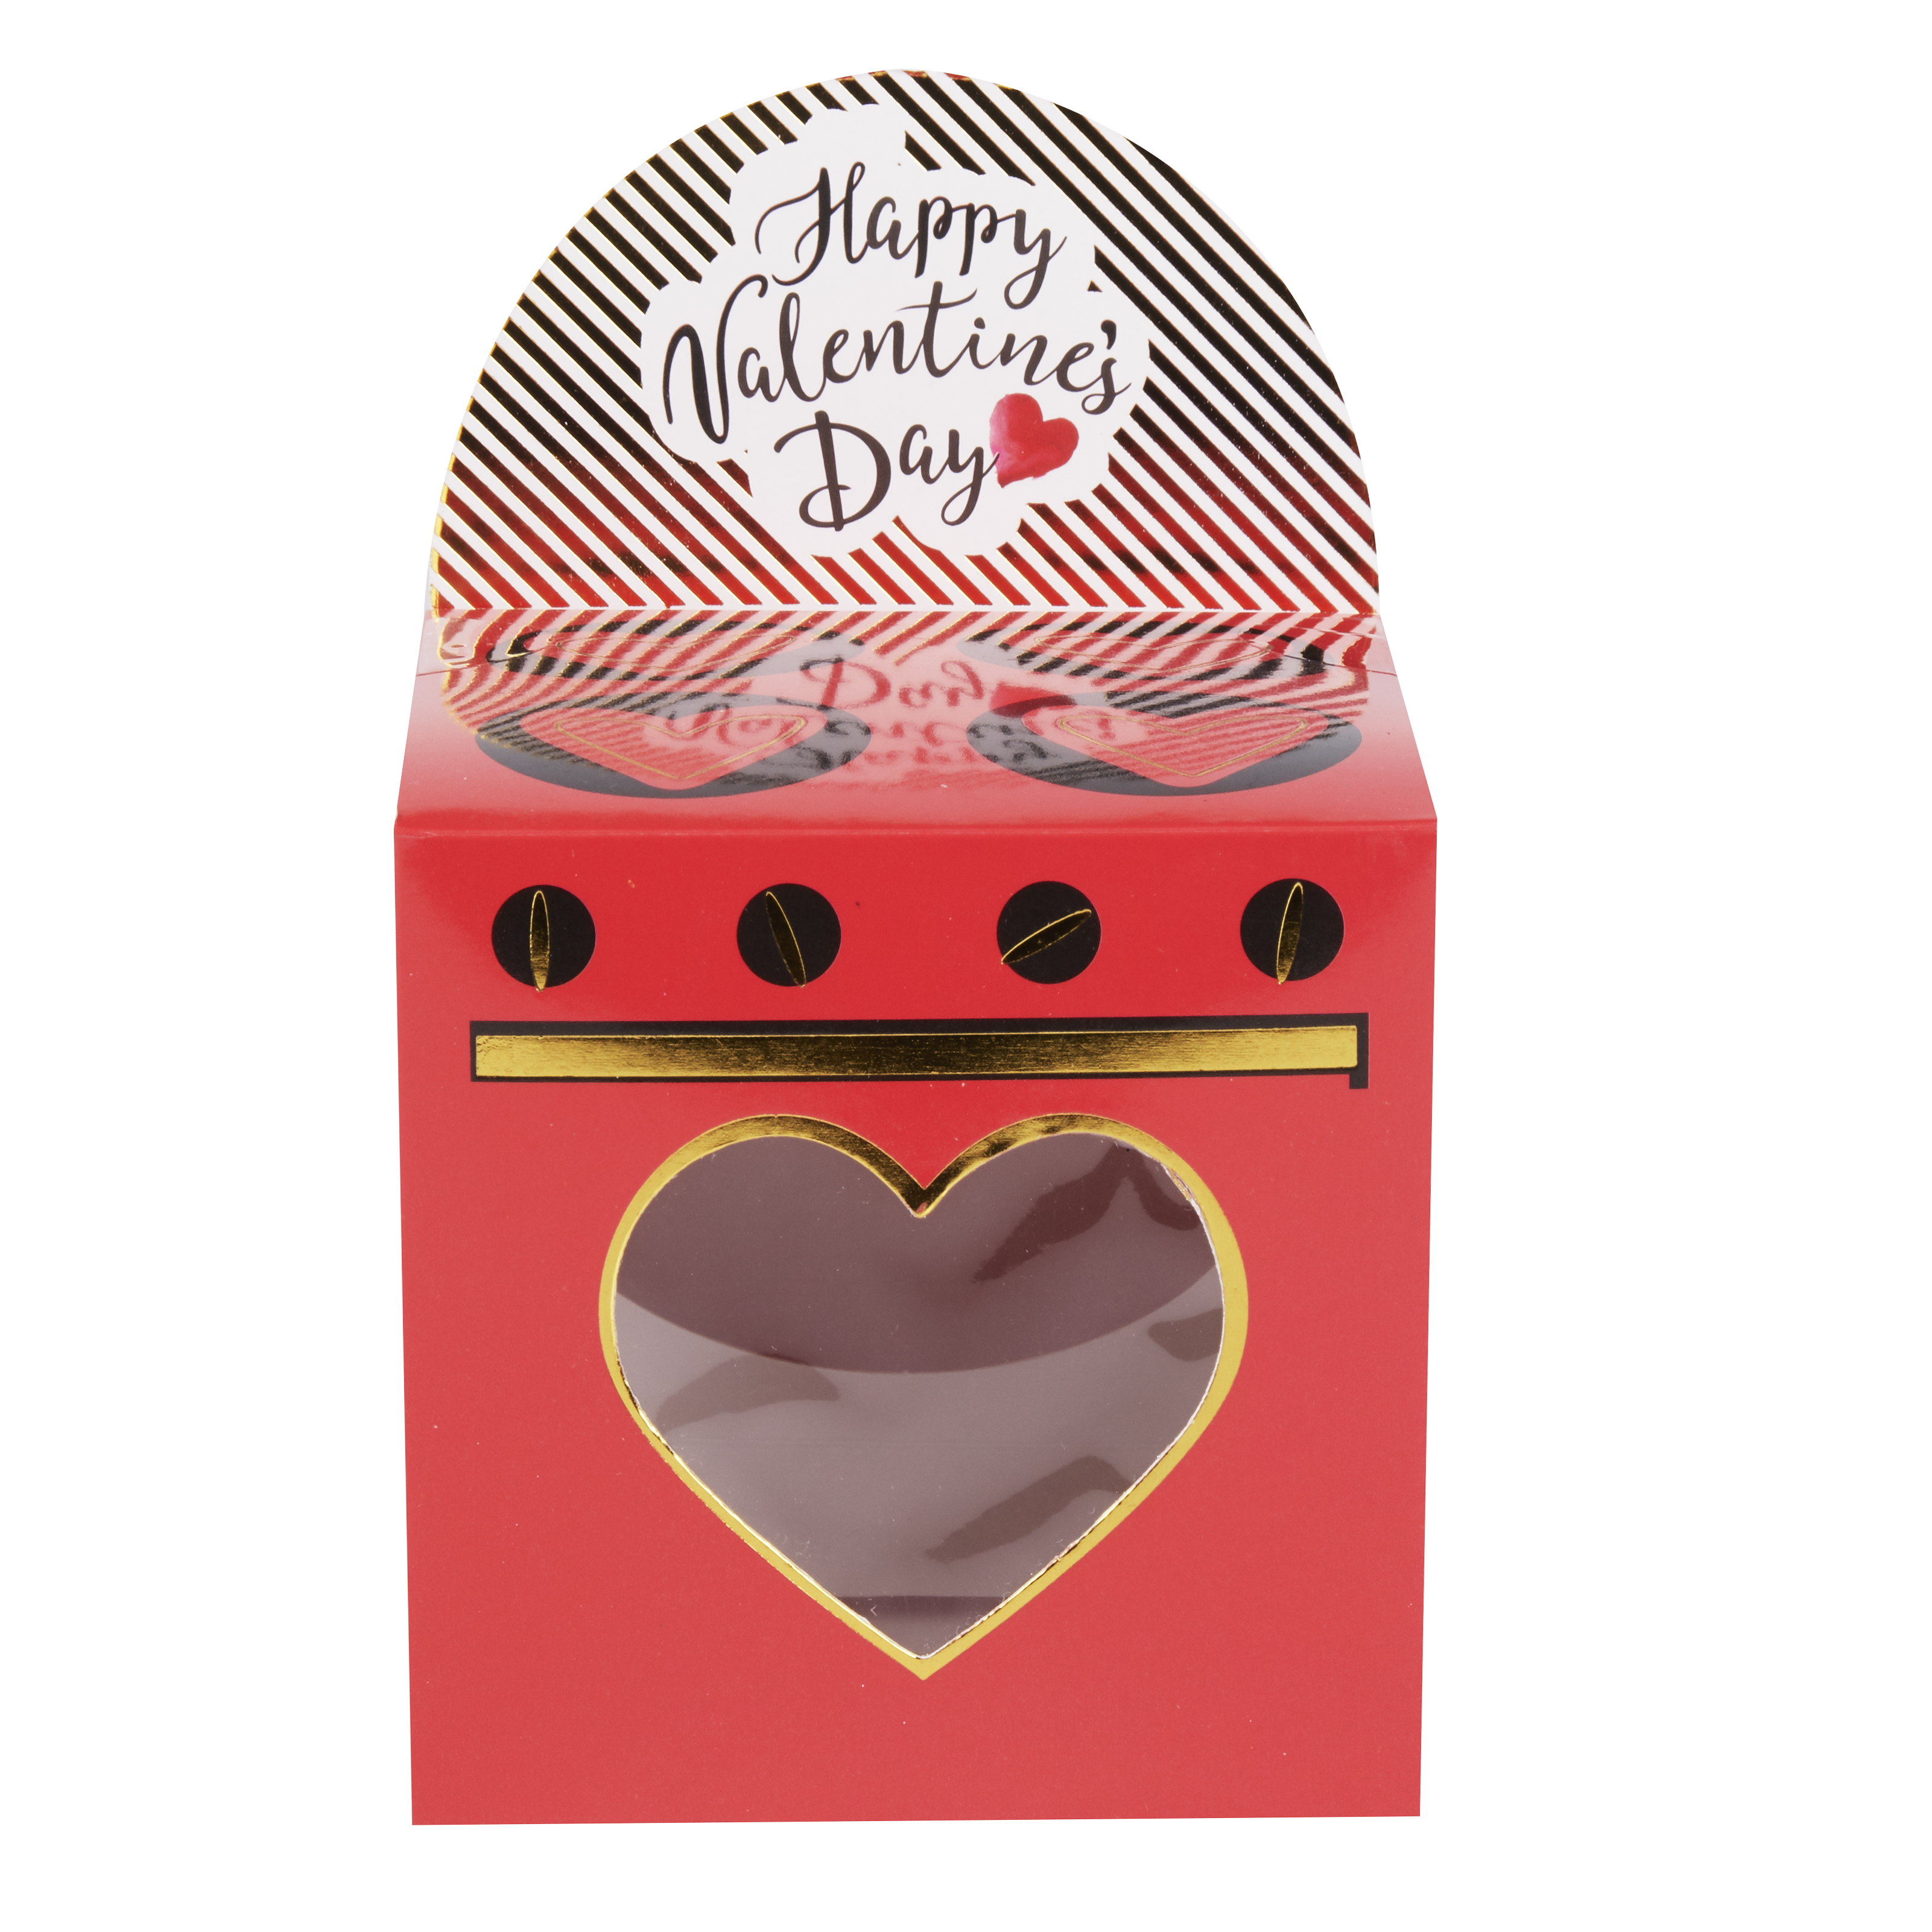 Way To Celebrate Valentine's Day Oven Cupcake Box